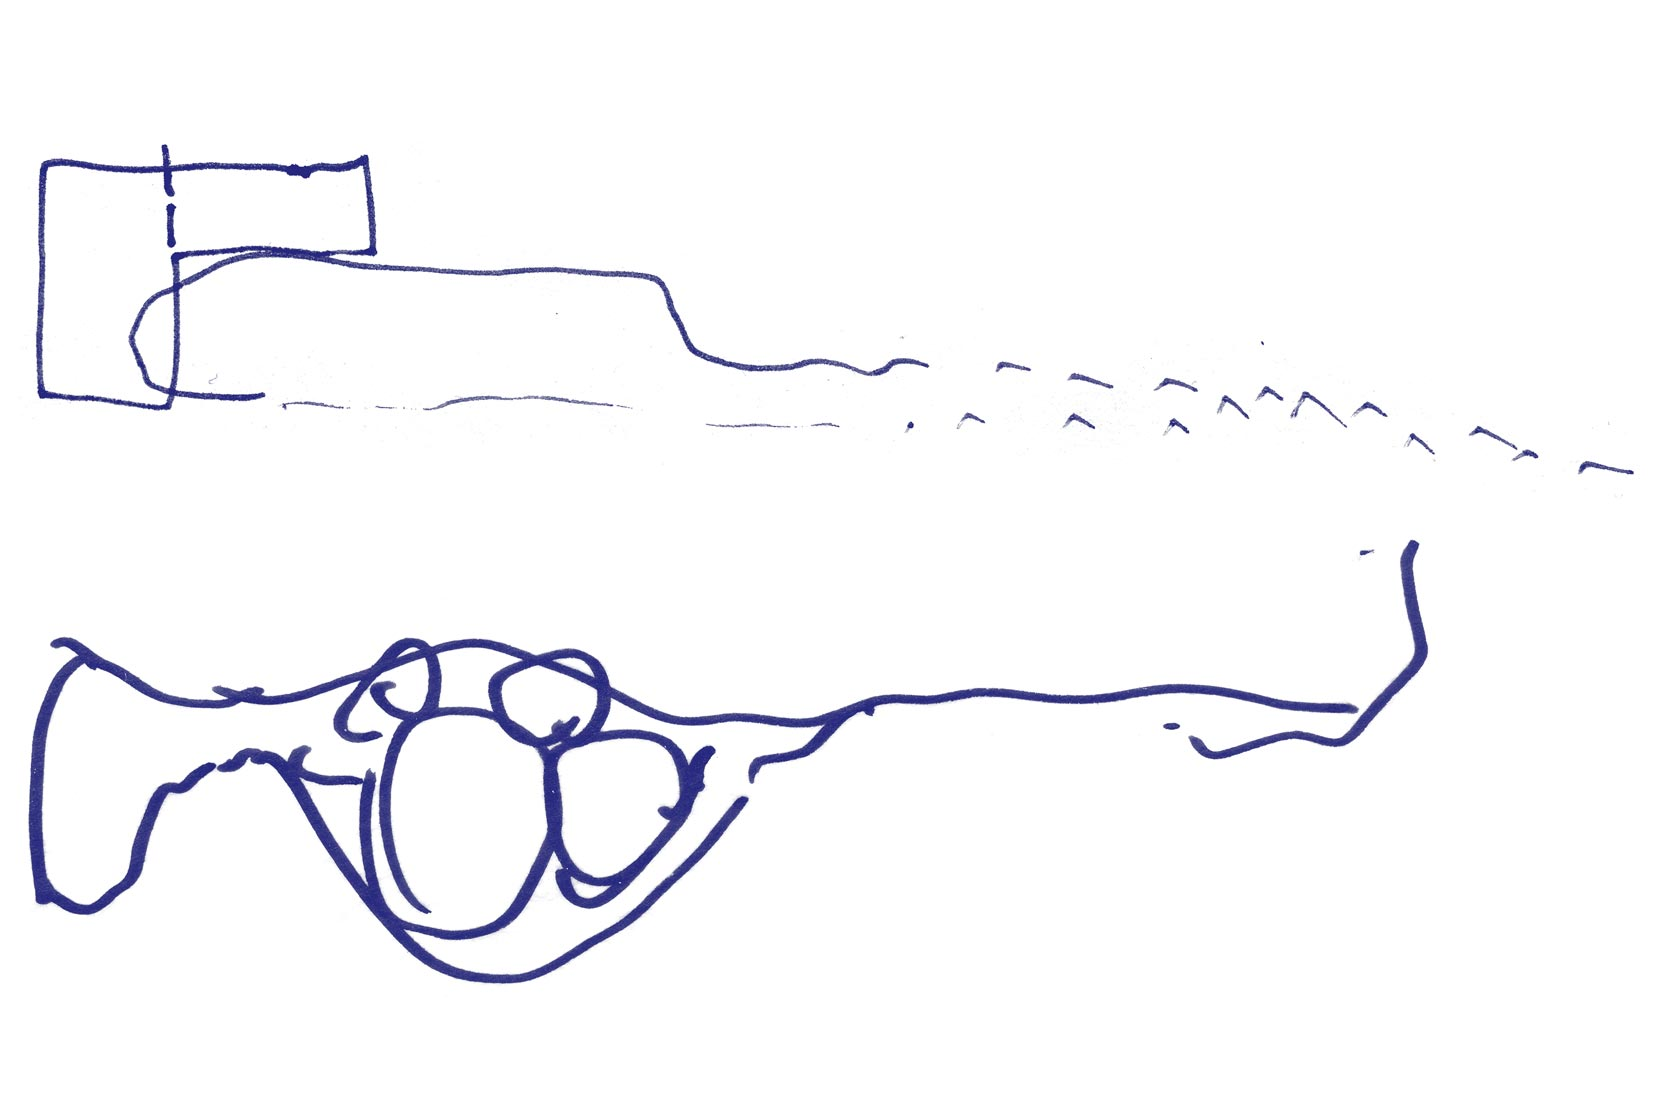 Elementary school: Sketch